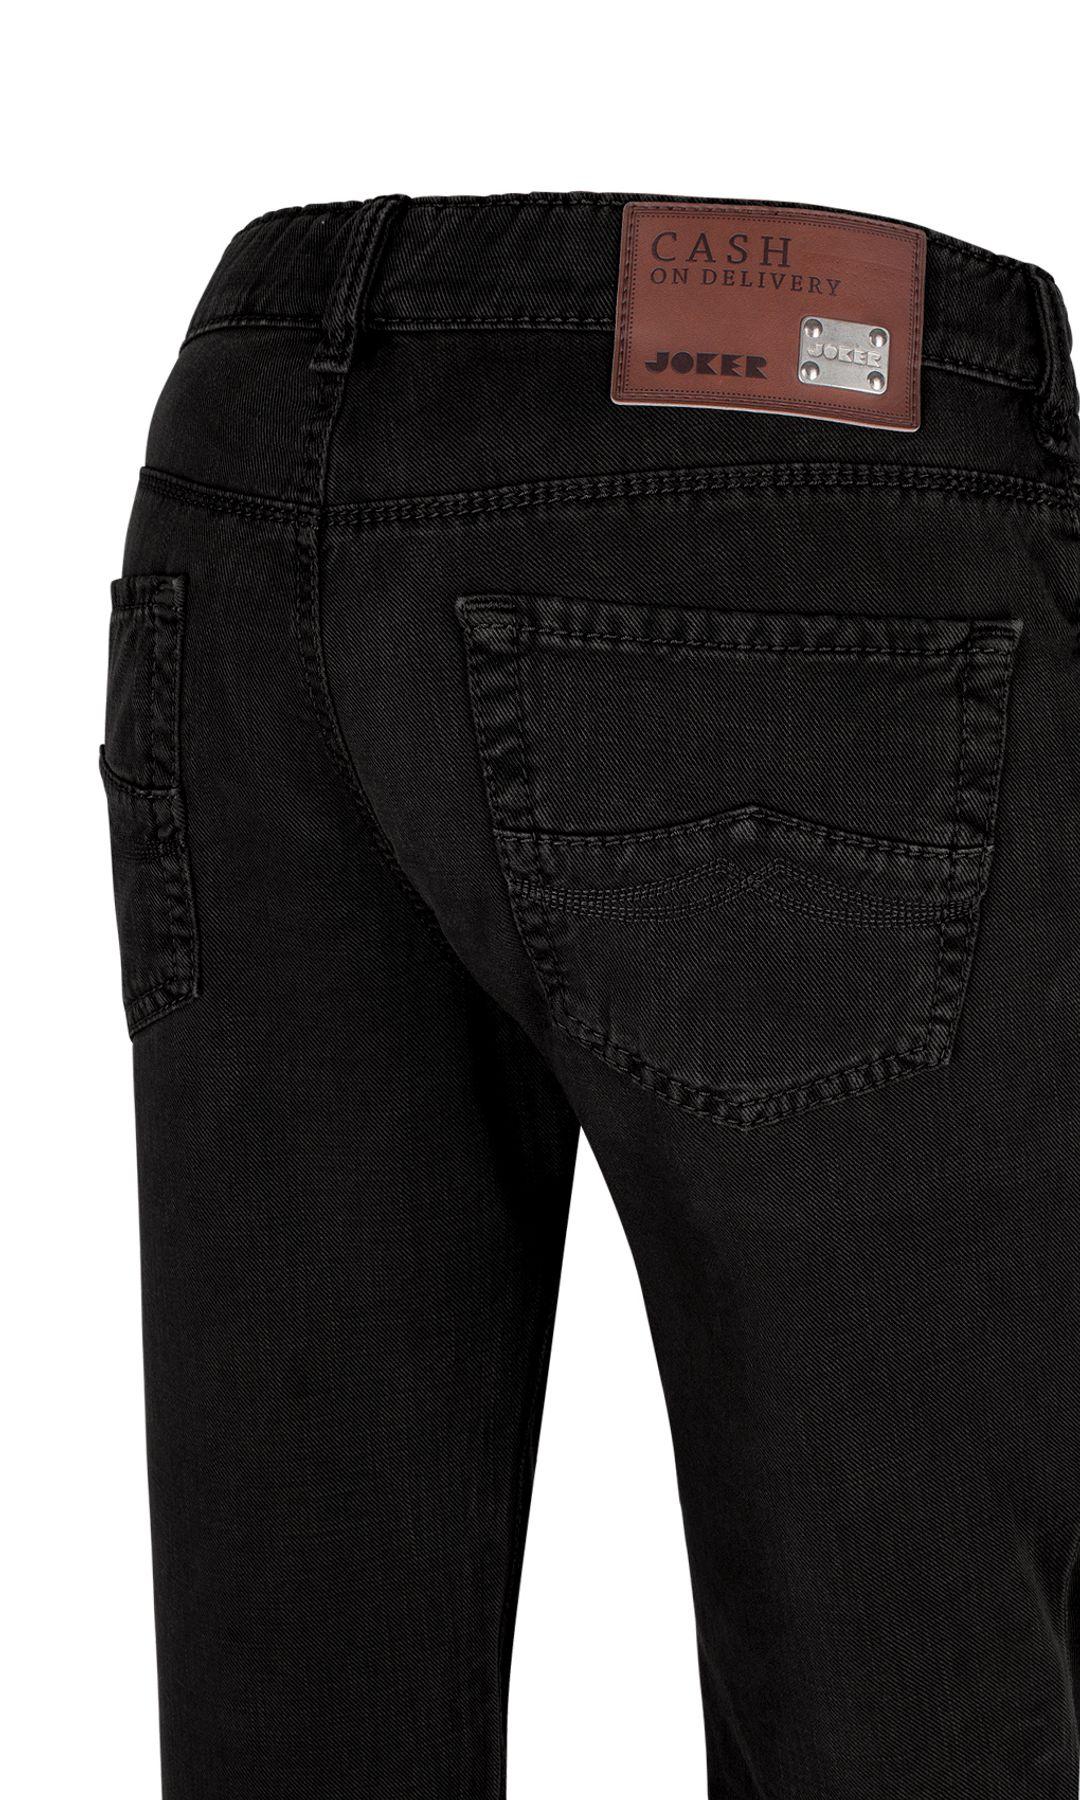 Joker- Herren 5-Pocket Jeans- schlanke Jeans aus Baumwoll-Stretch - Freddy (1983401) – Bild 2